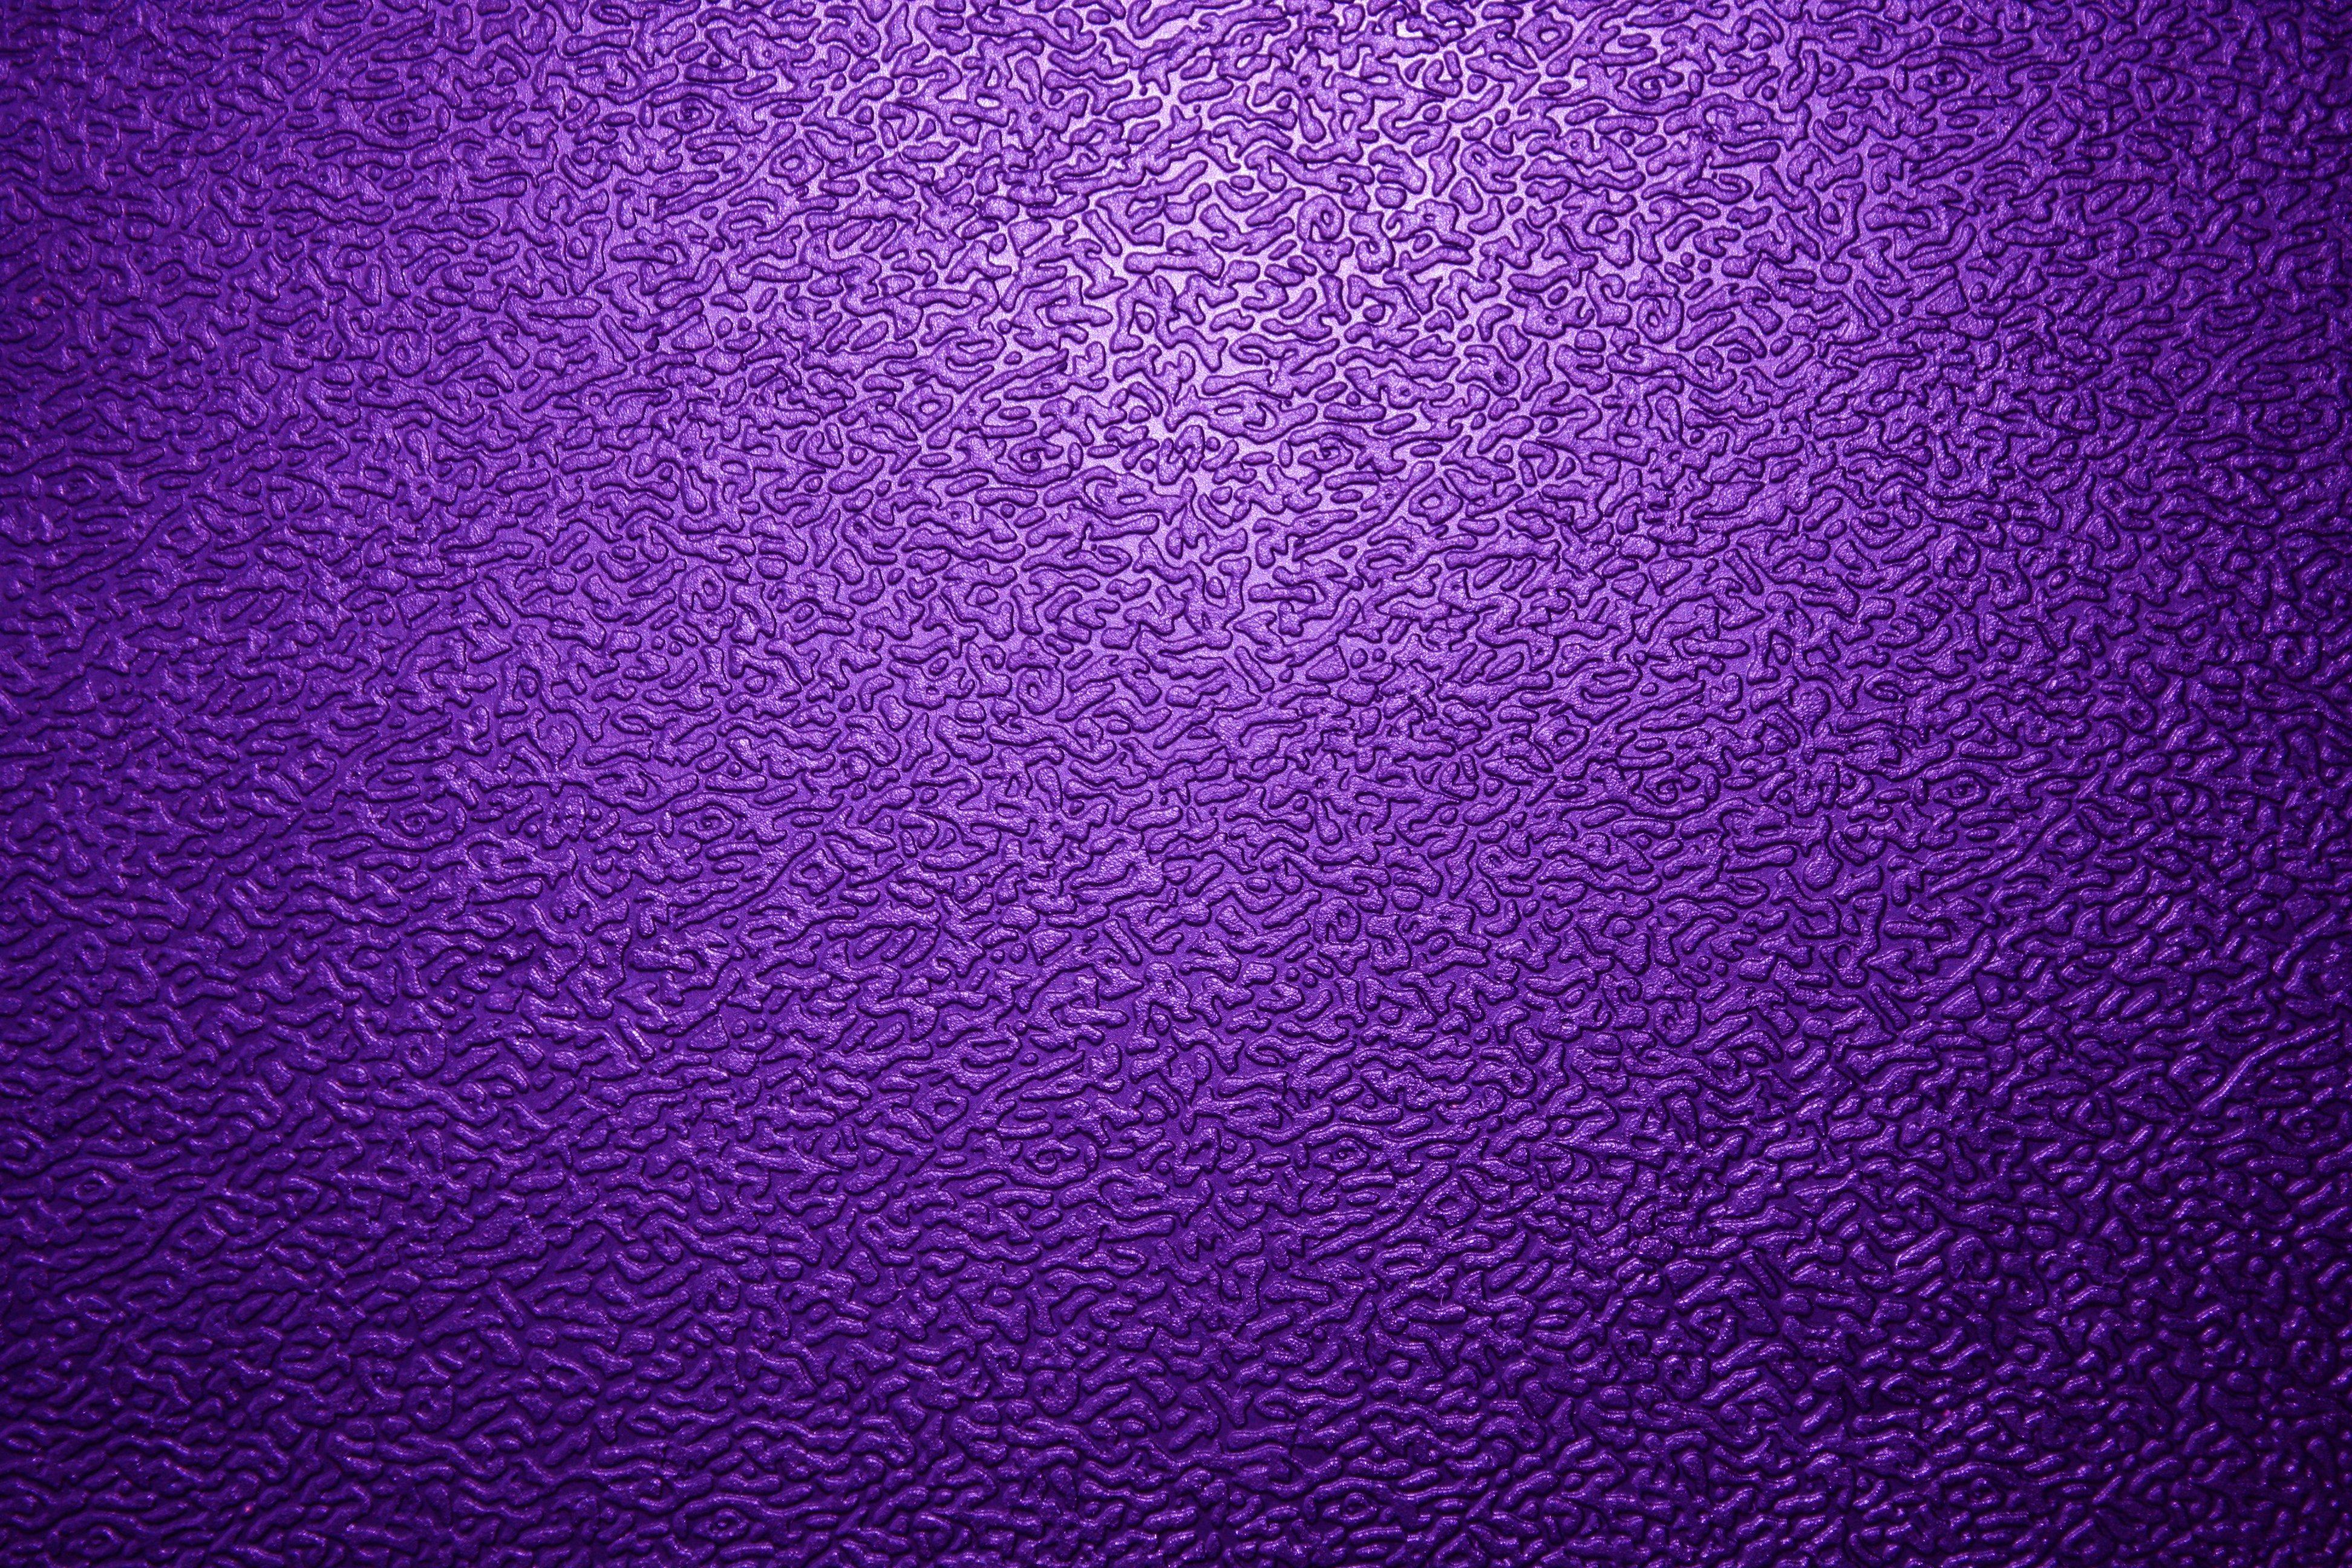 Textured Purple Plastic Close Up High Resolution Photo 3888x2592